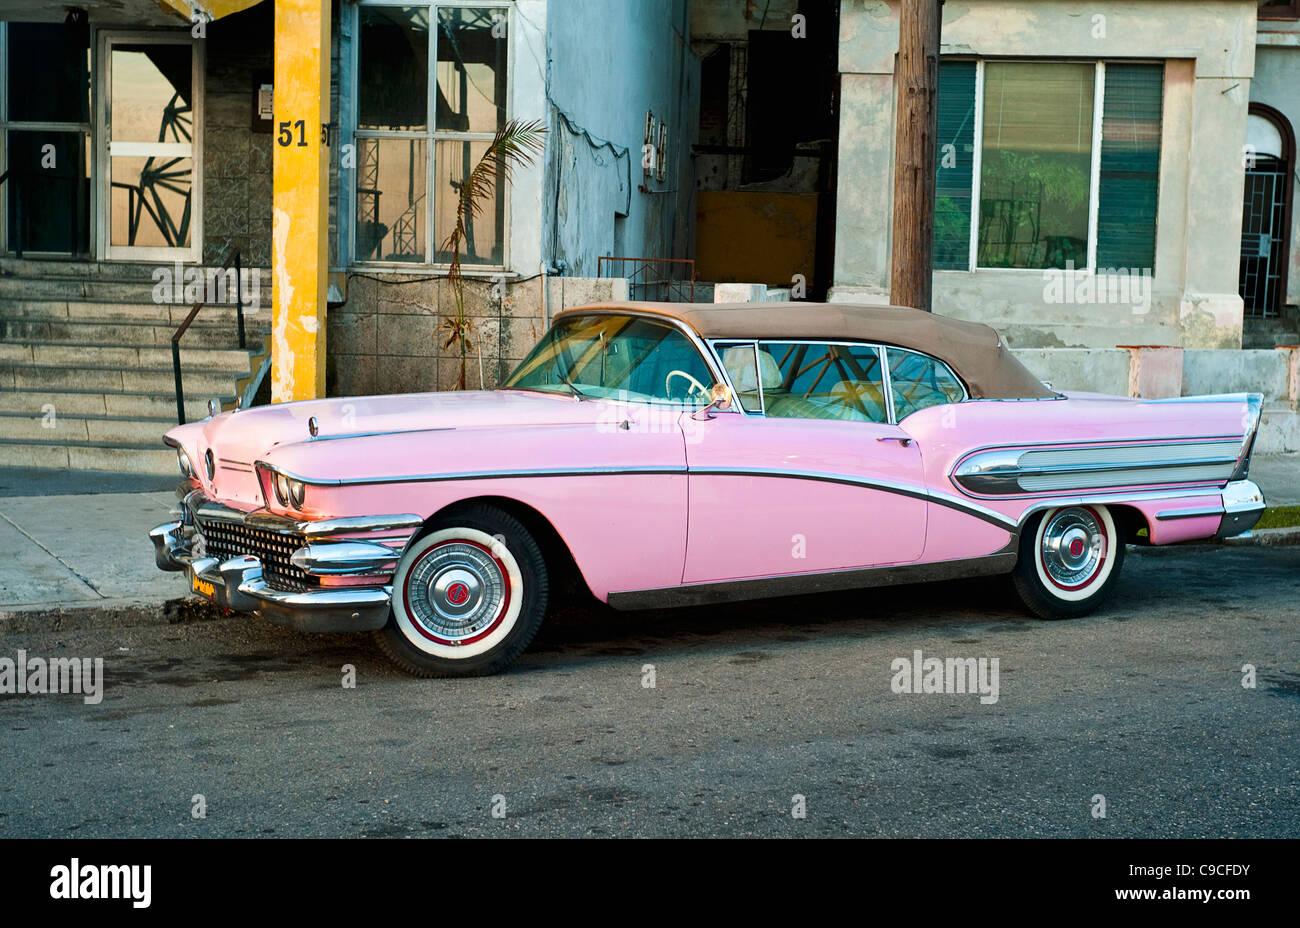 Cuba, Caribbean, Havana, Pink vintage Buick convertible car with the ...